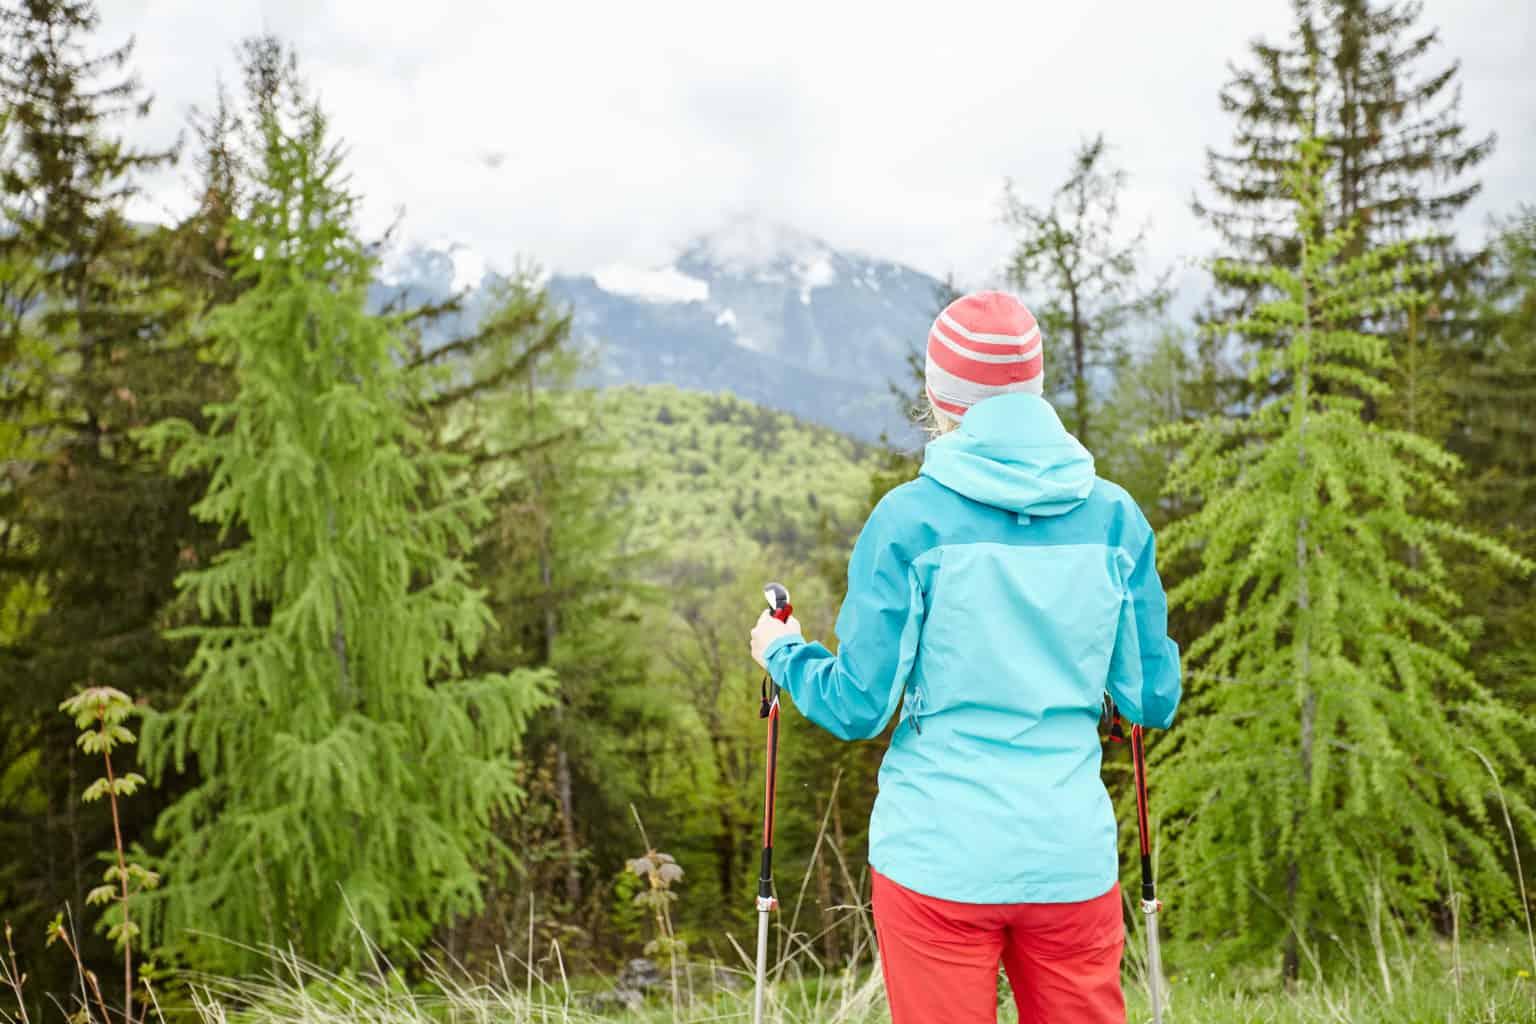 Hiker wearing softshell clothing